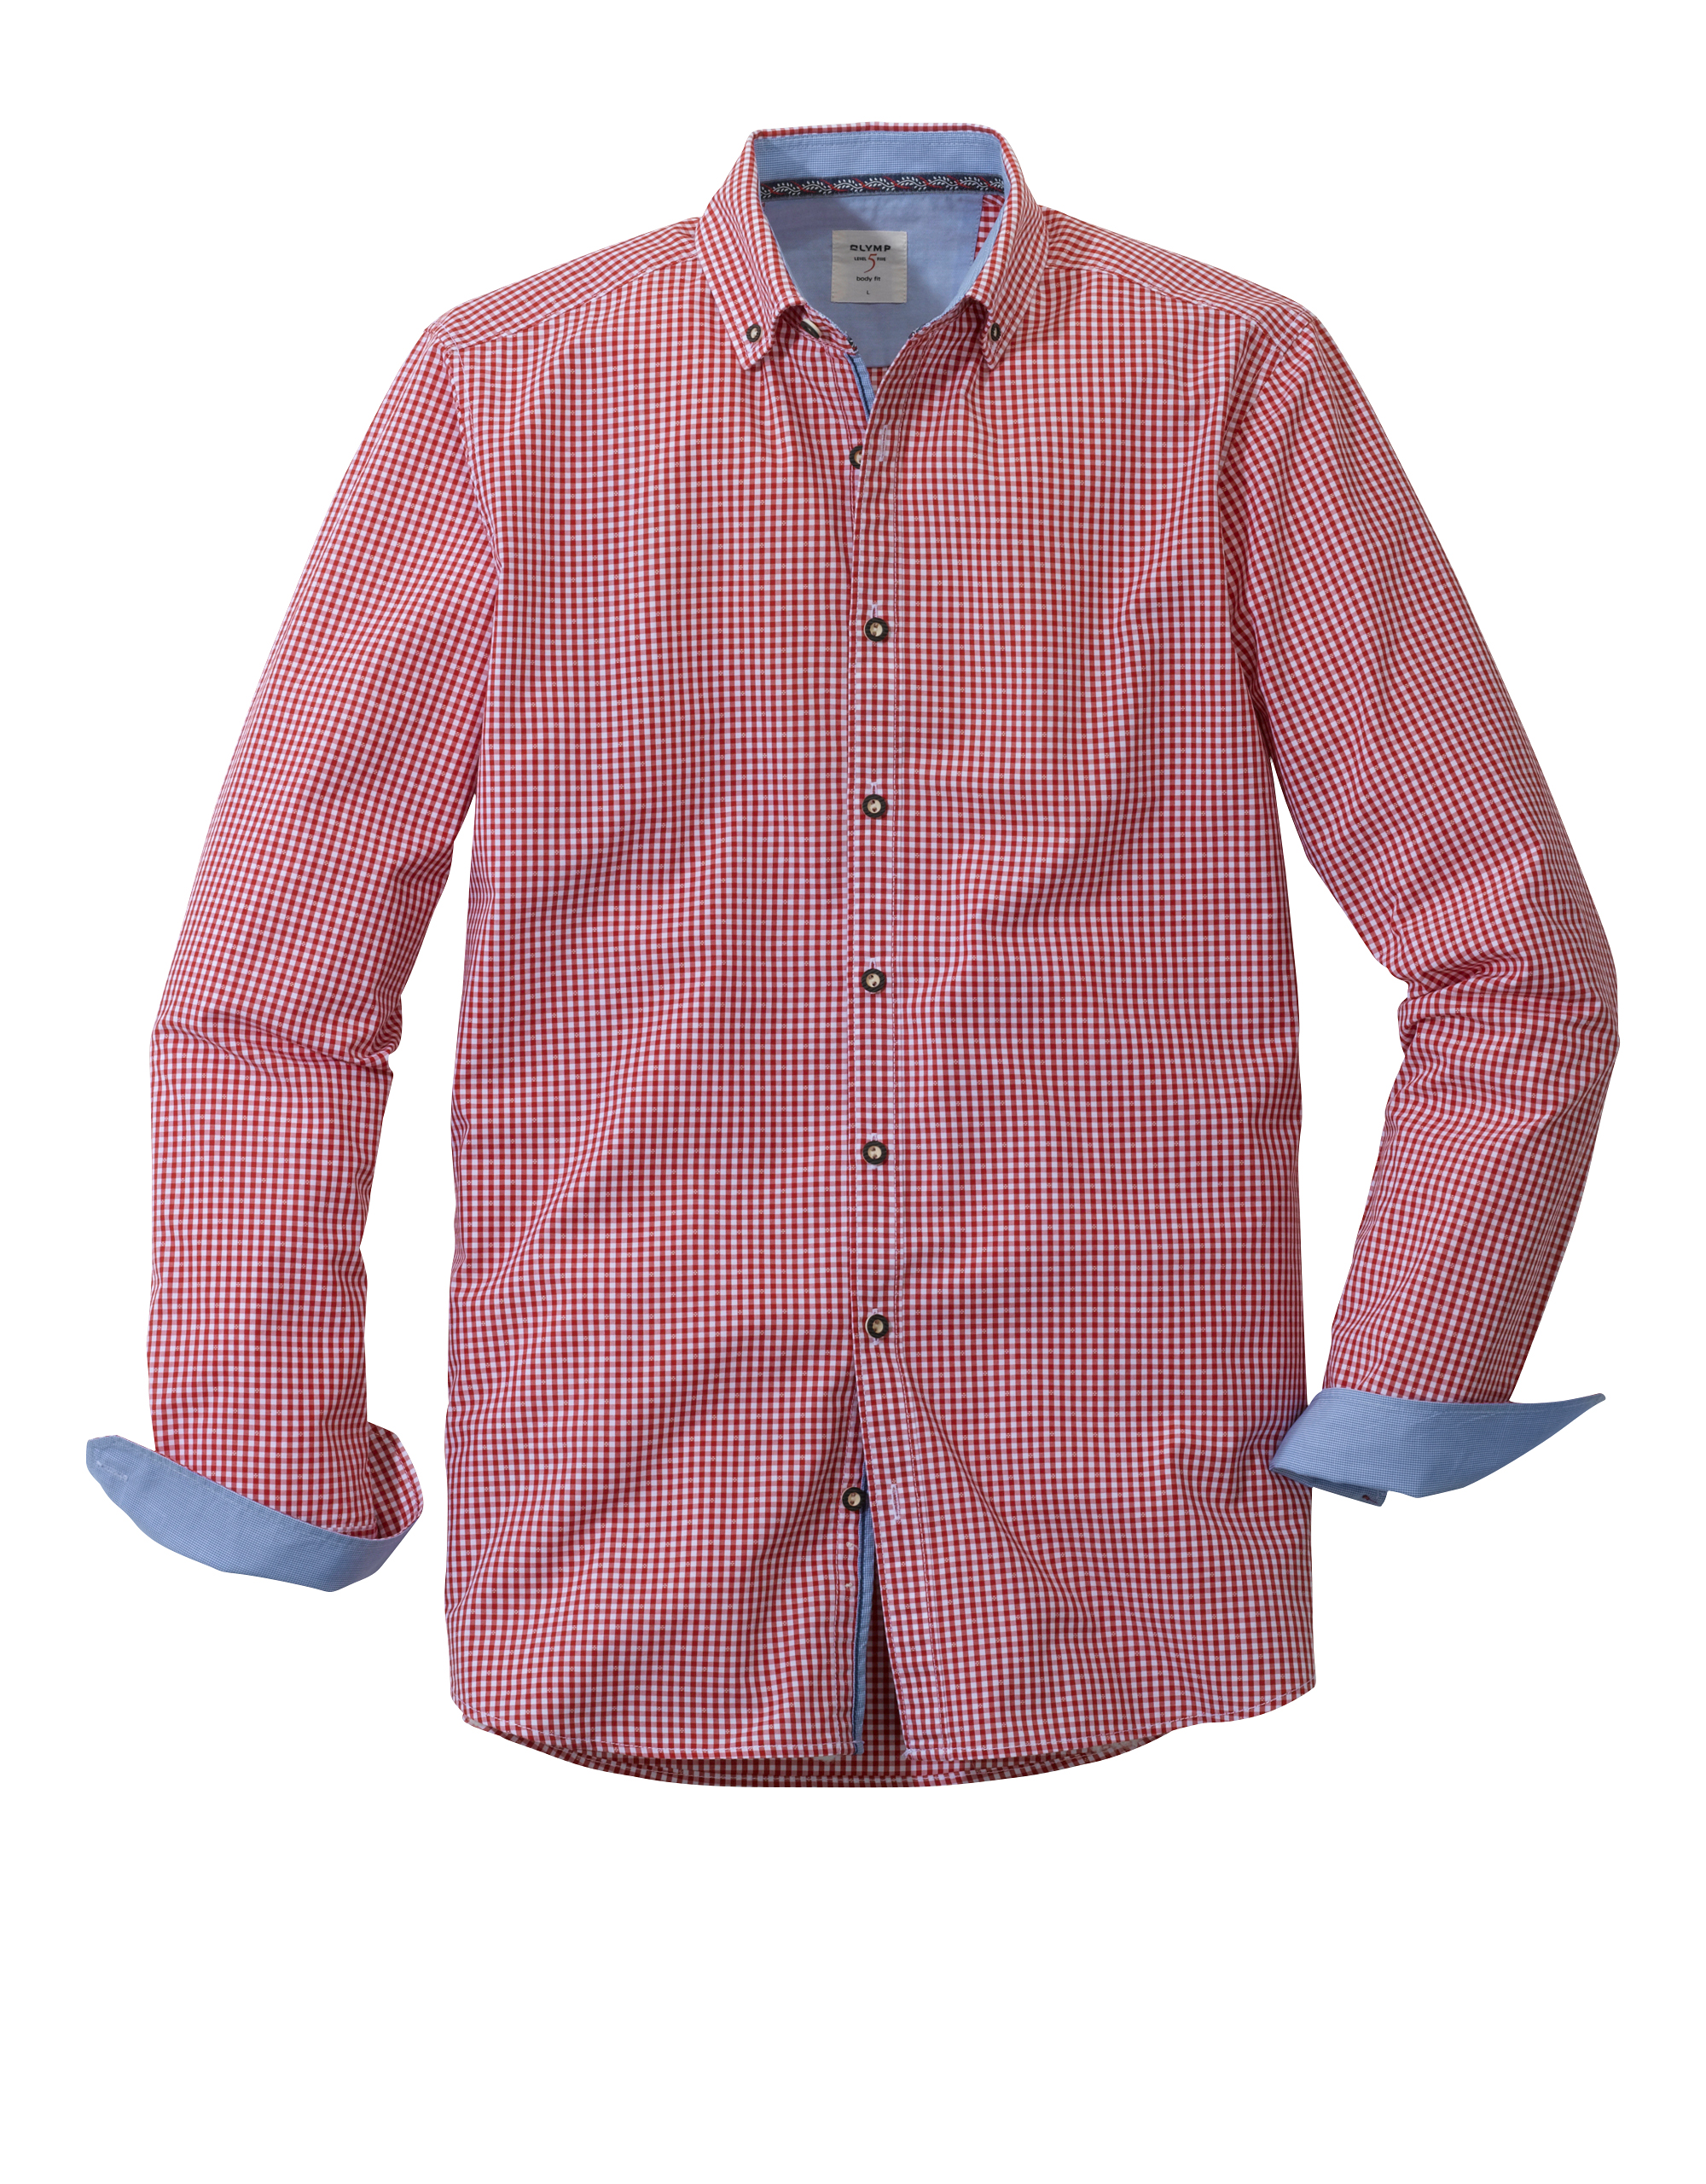 OLYMP Trachtenhemd, body fit, Button-down, Rot, M | Bekleidung > Hemden > Trachtenhemden | OLYMP